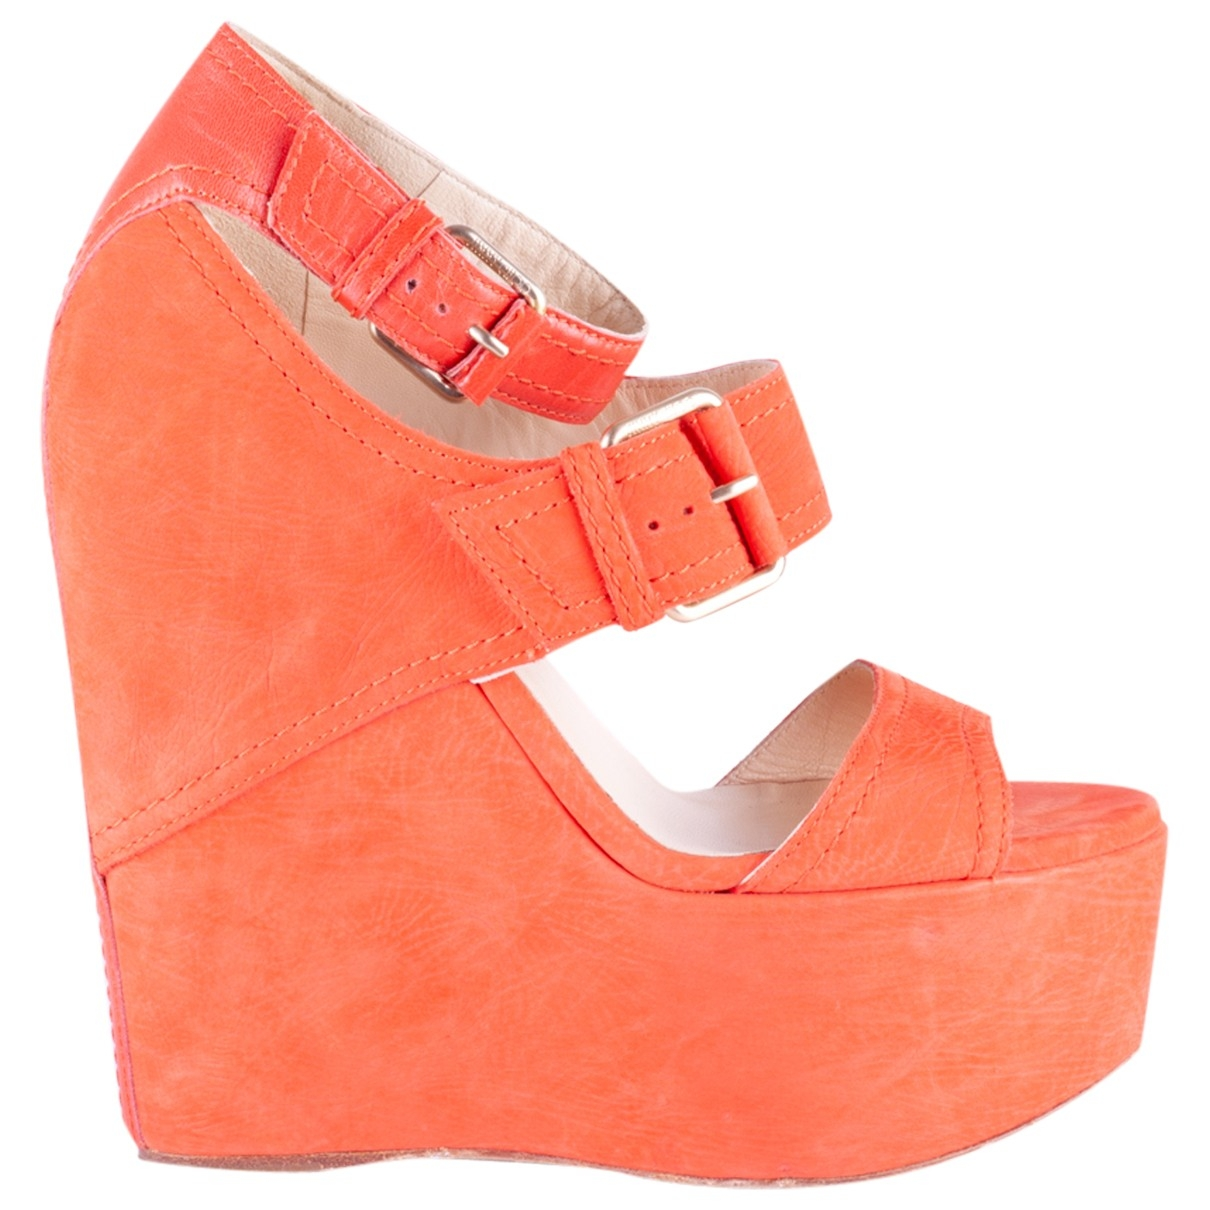 Jimmy Choo \N Orange Suede Sandals for Women 36 EU